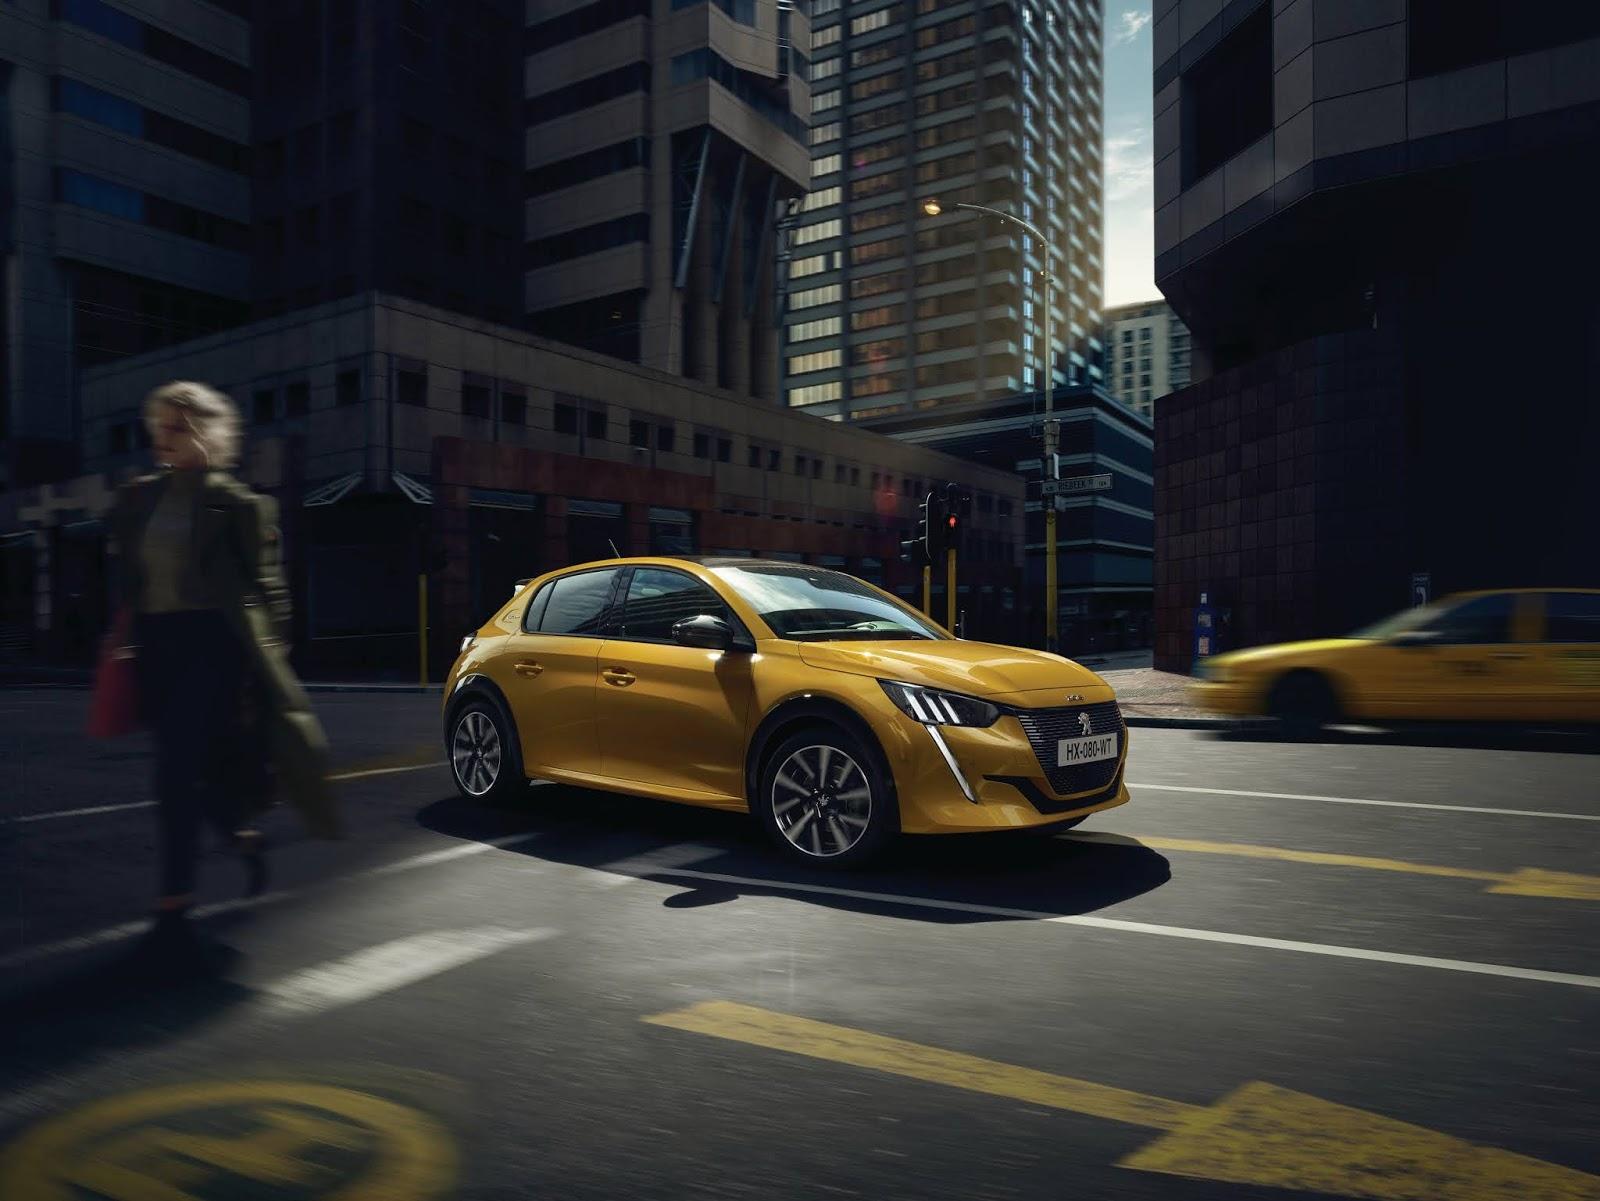 PEUGEOT 208 2019 125 FR 1 1 Peugeot : Πρώτη στις εταιρικές πωλήσεις για 2 συνεχόμενα έτη Peugeot, ειδήσεις, πωλήσεις, πωλήσεις αυτοκινήτων